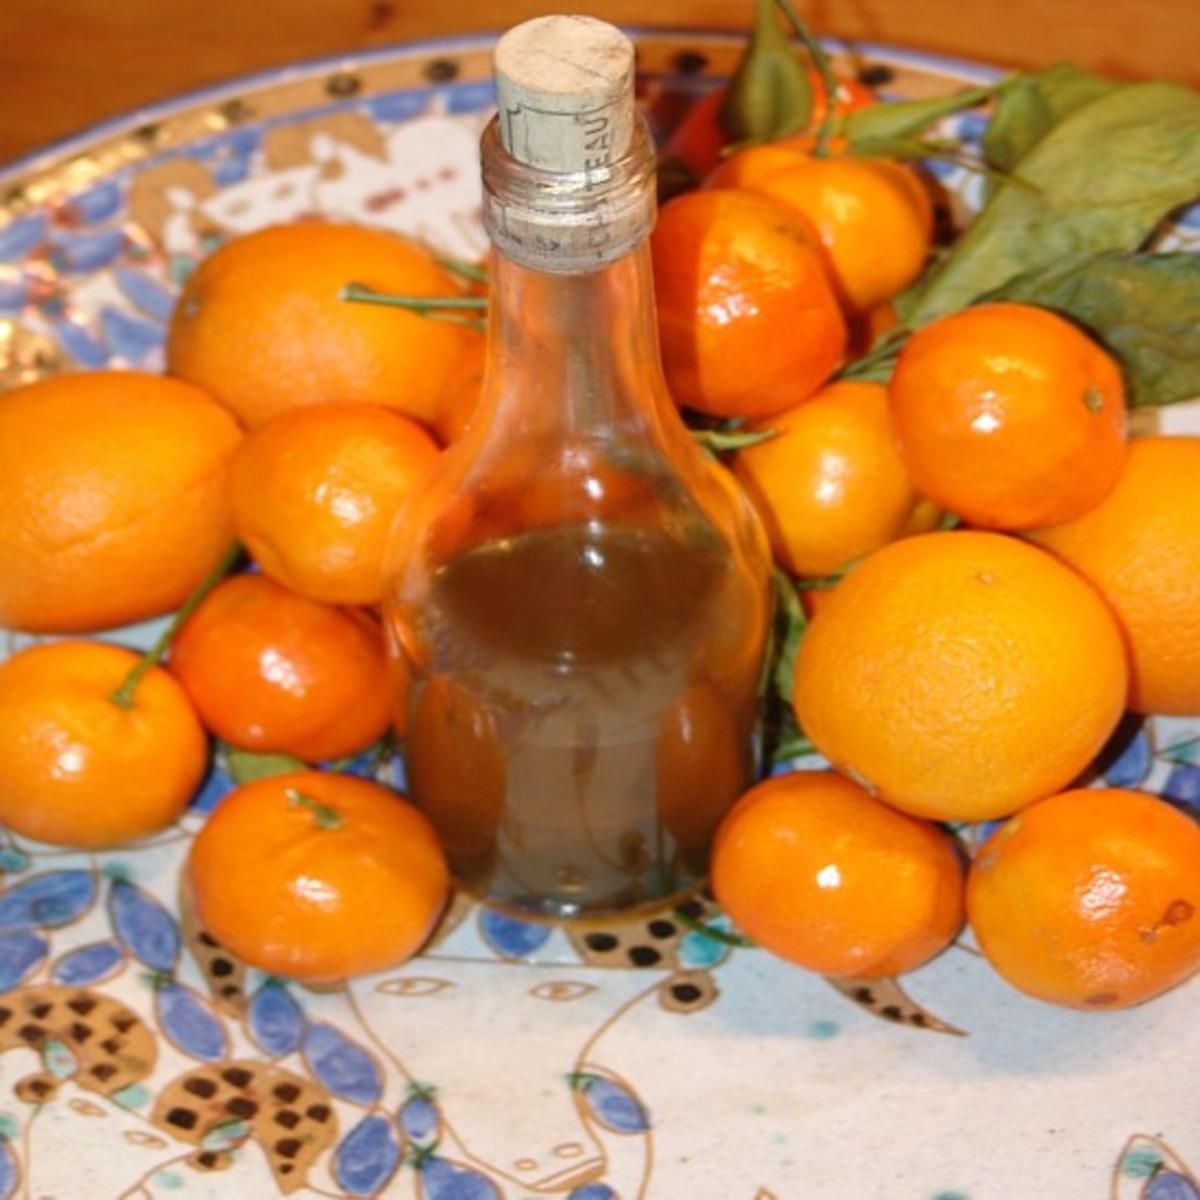 The Rare Mandarinetto